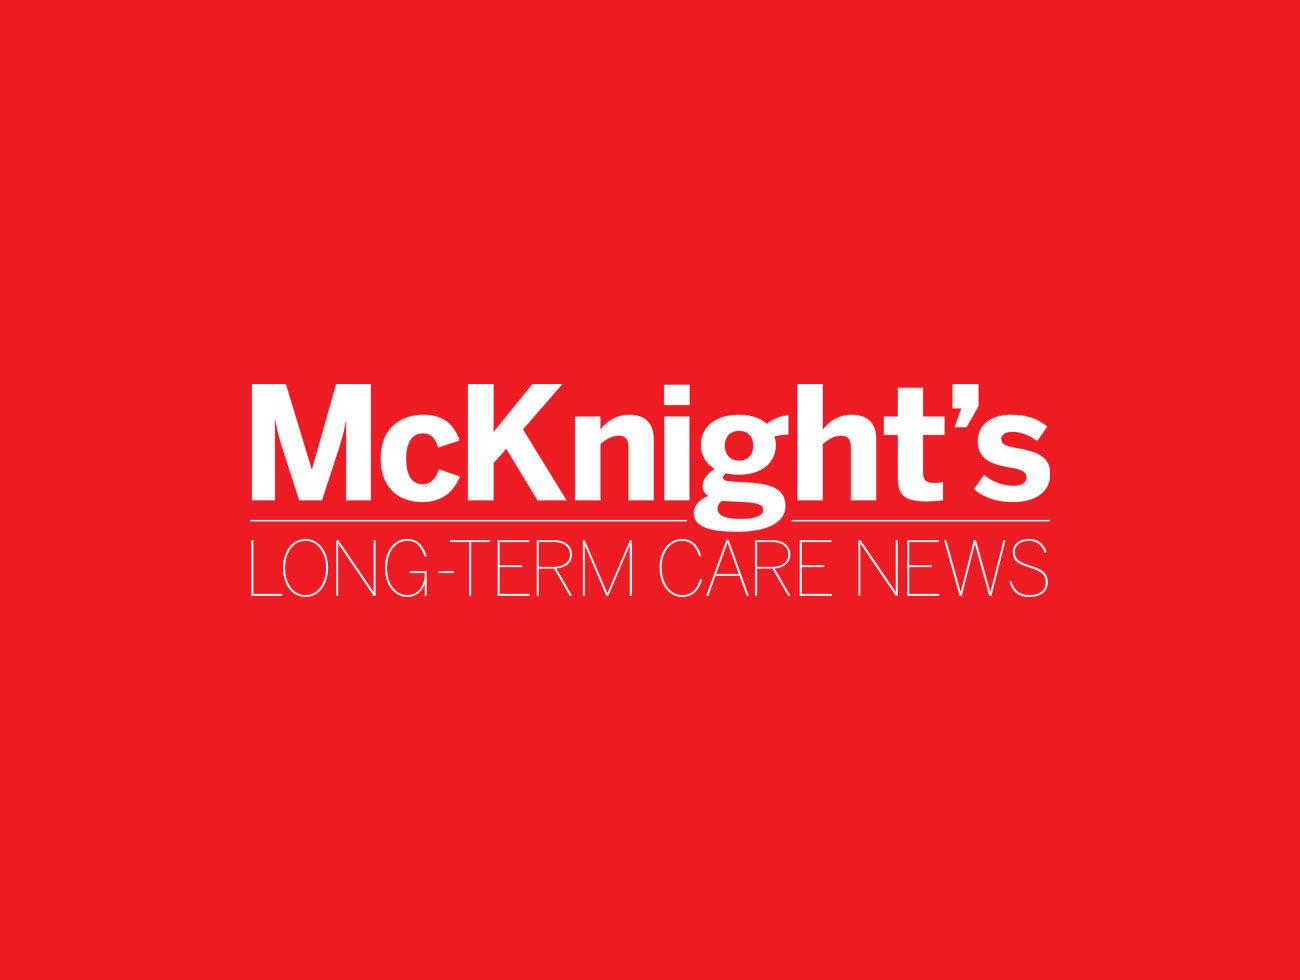 McKnights Long Term Care News